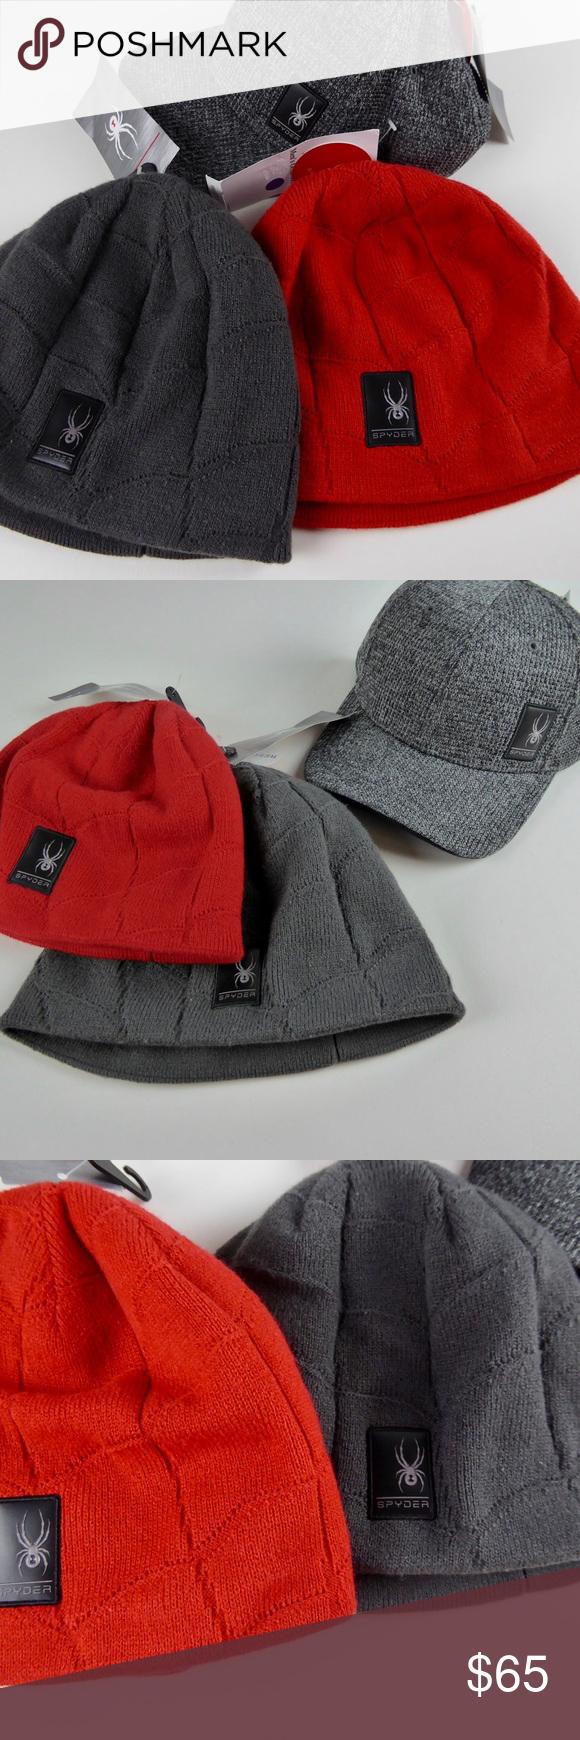 57c8671aca9 Spyder Nebula Beanie   Stryke Fleece Cap Set NWT Spyder 🕷 Hat Set 🕷Spyder  design